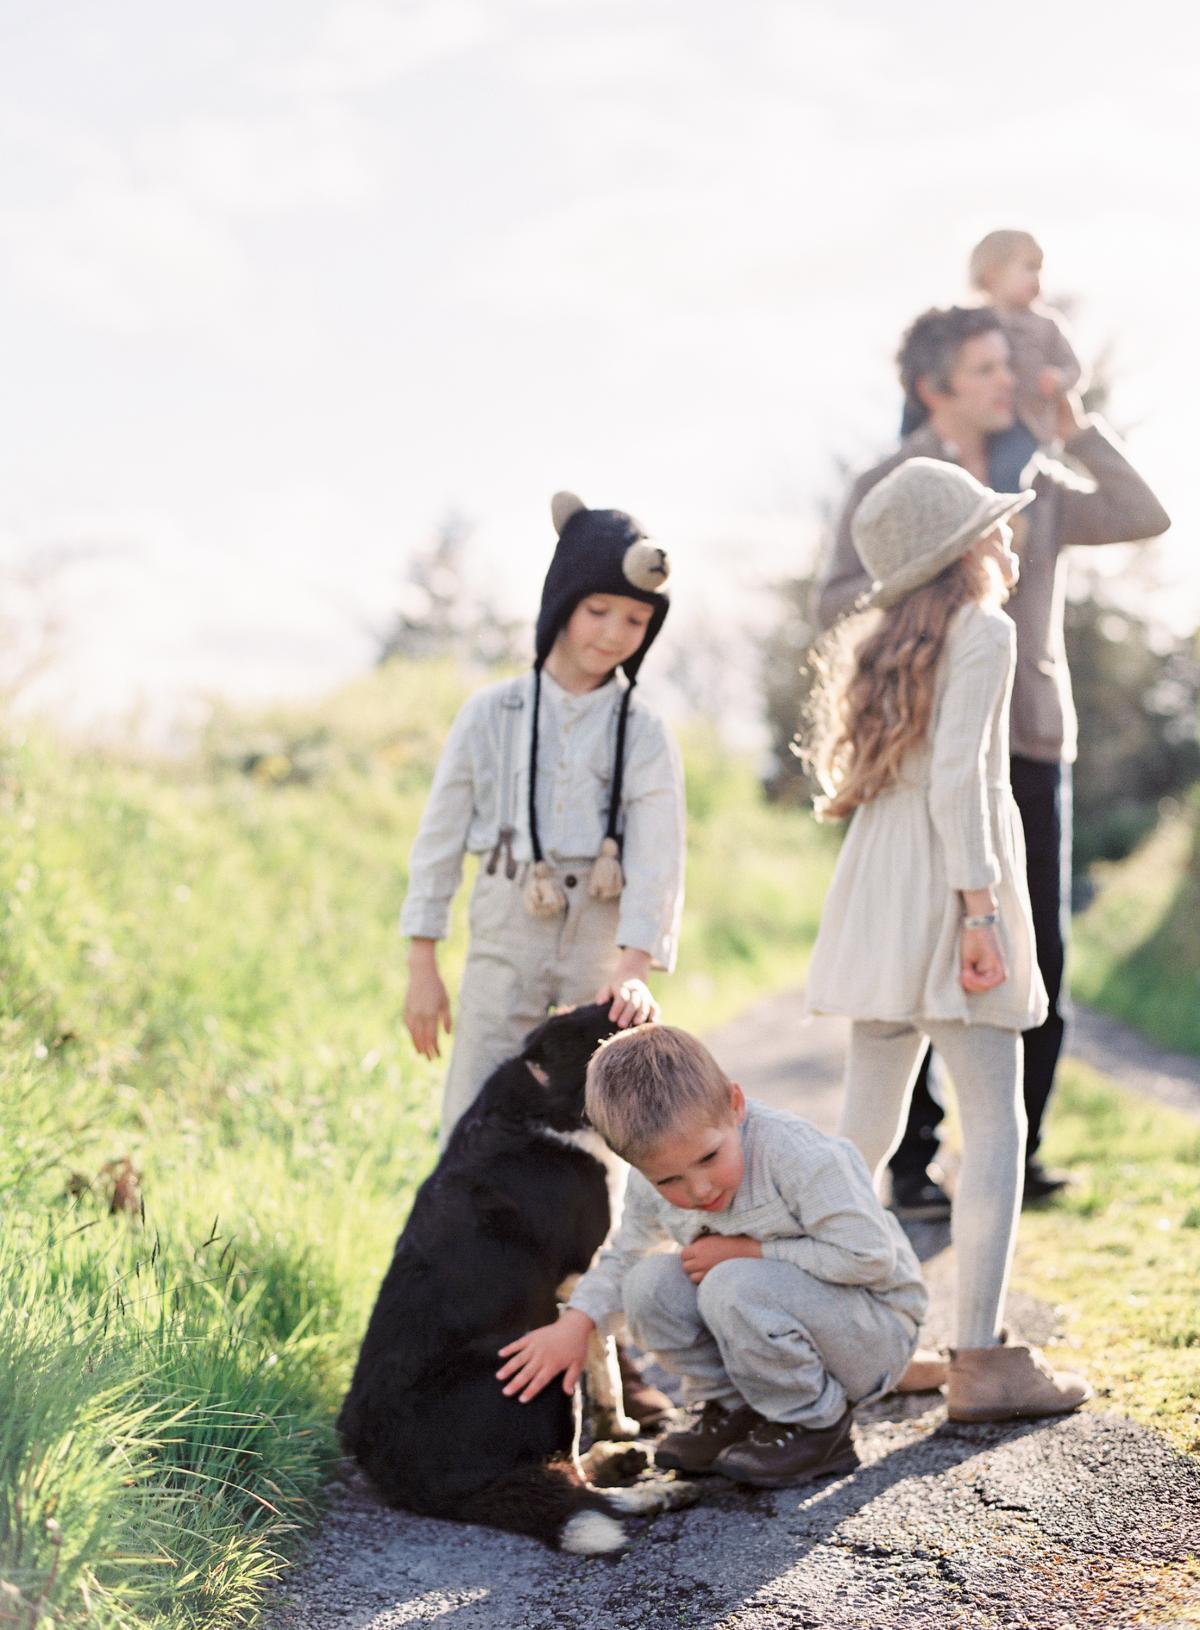 Pearl collins godiva cork ireland family photos 0003